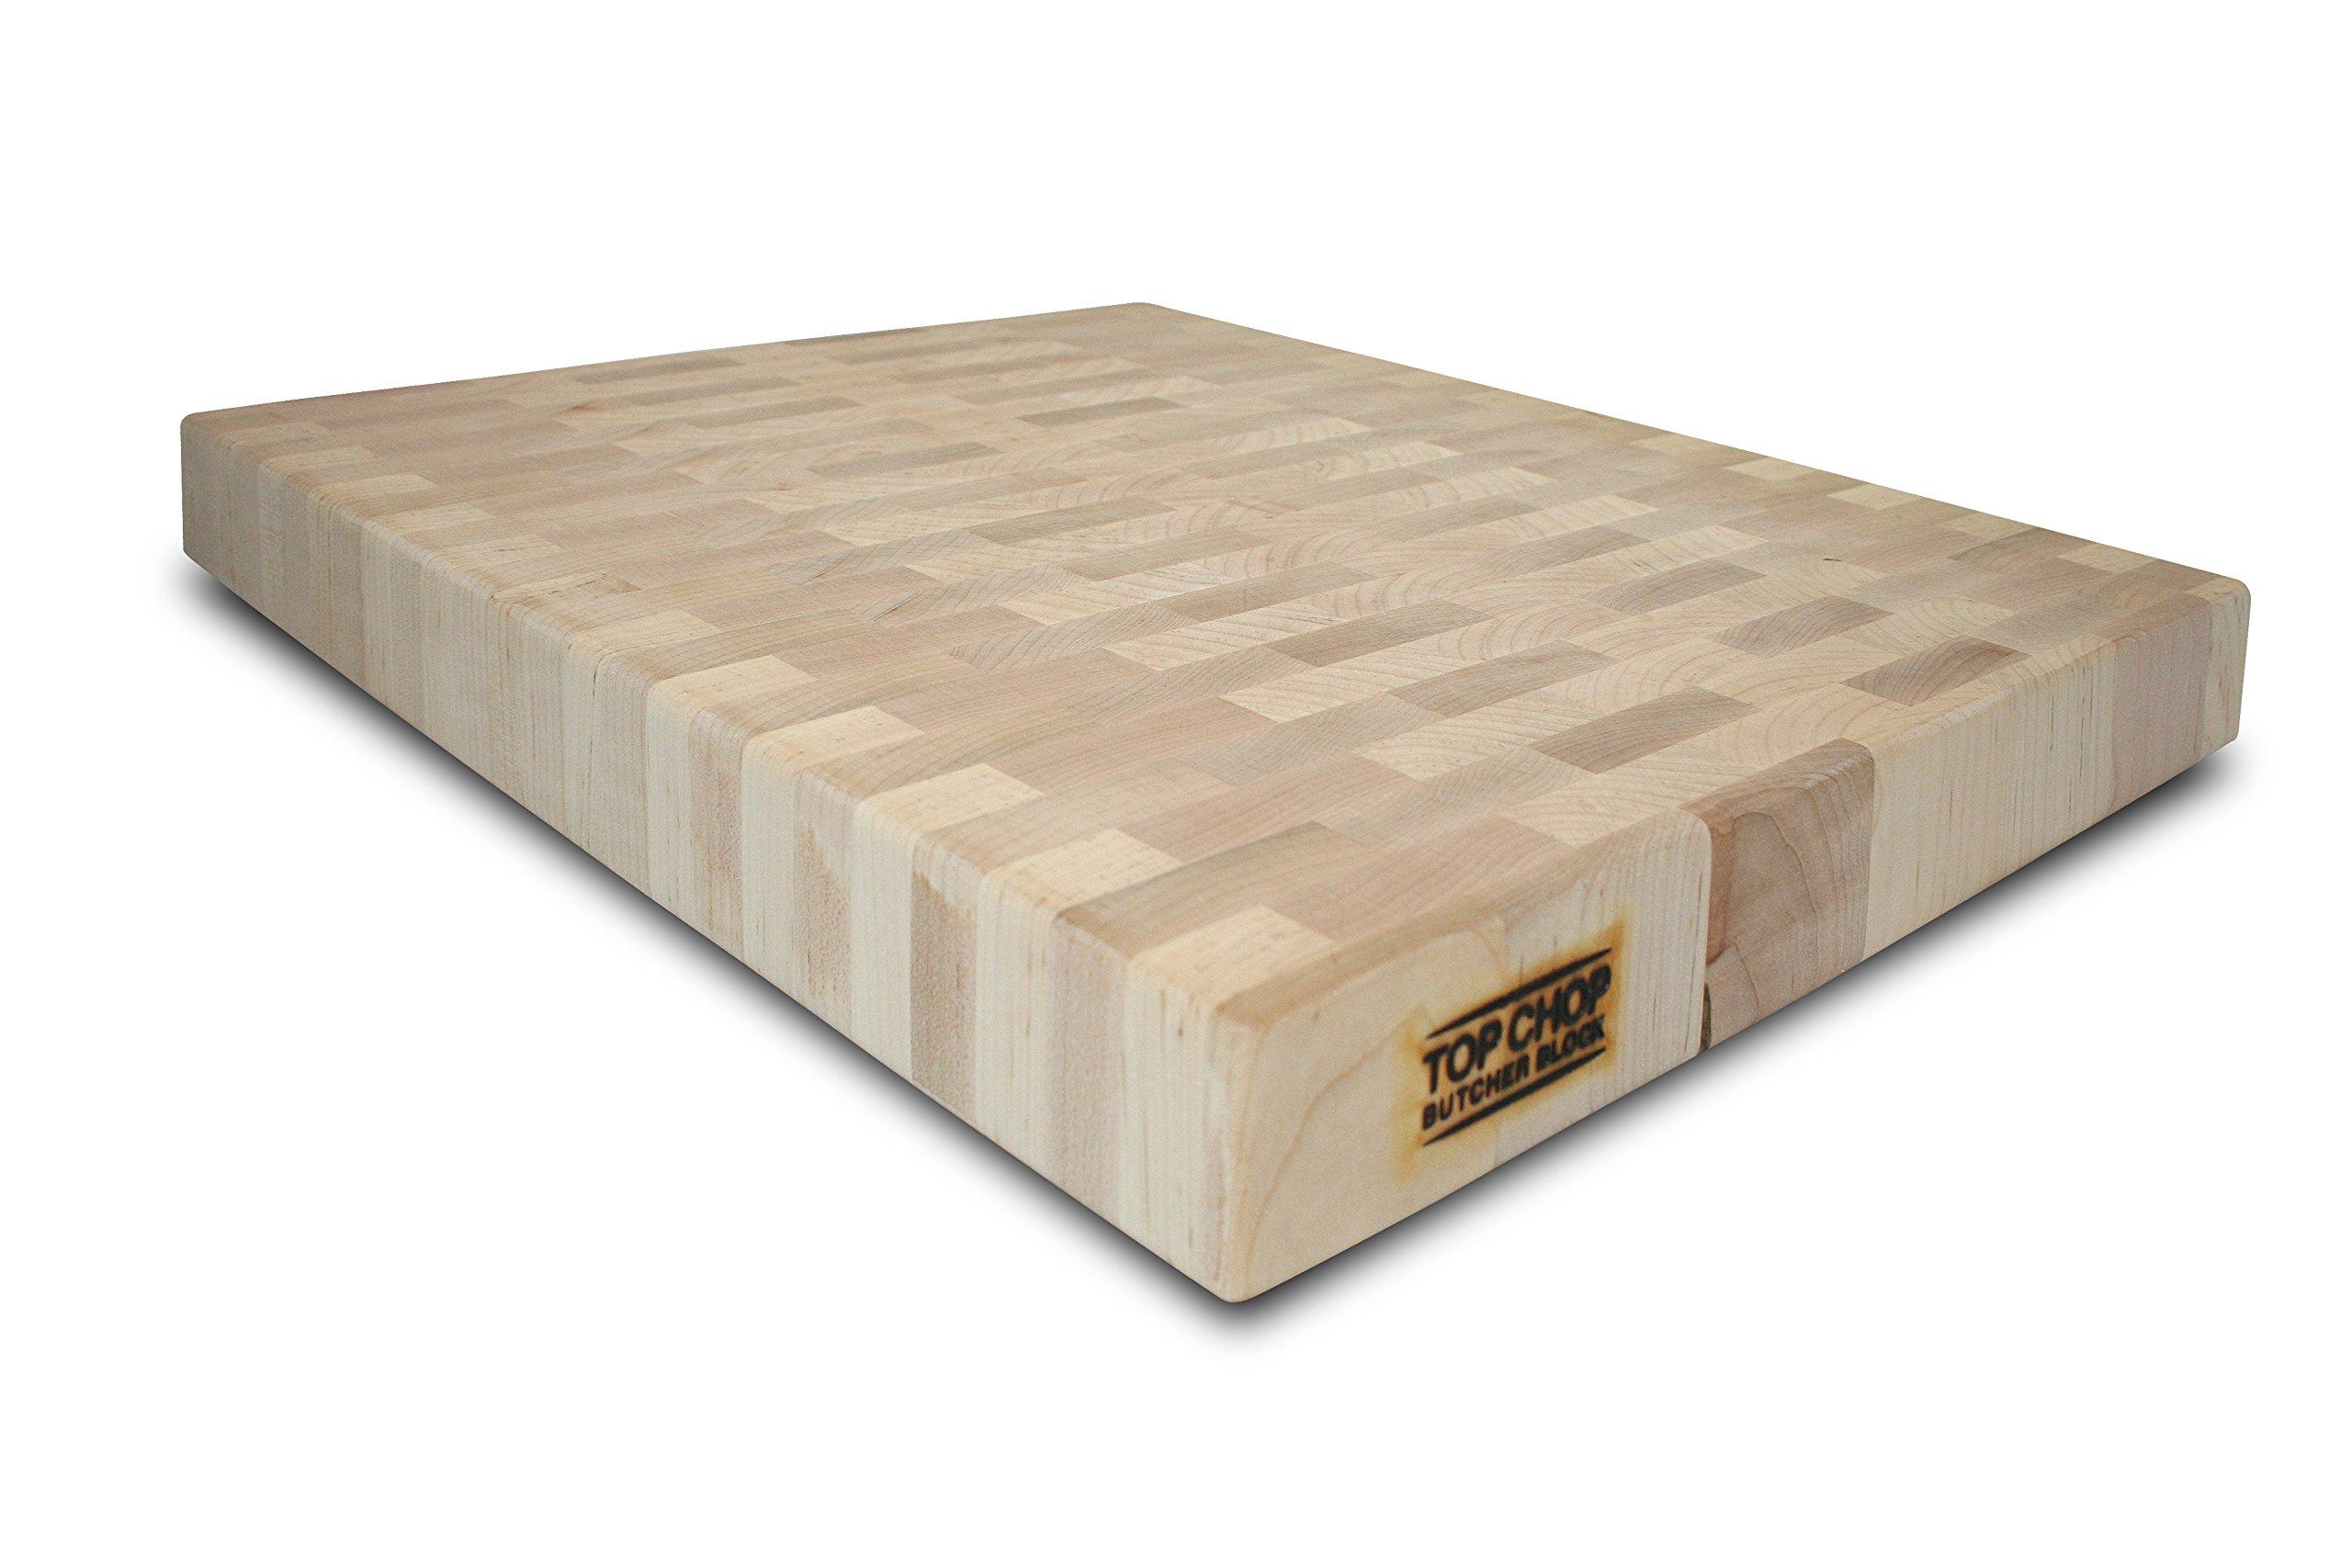 Top Chop Butcher Block Premium Reversible End Grain Cutting Board, Maple, 16'' x 18'' x 2''